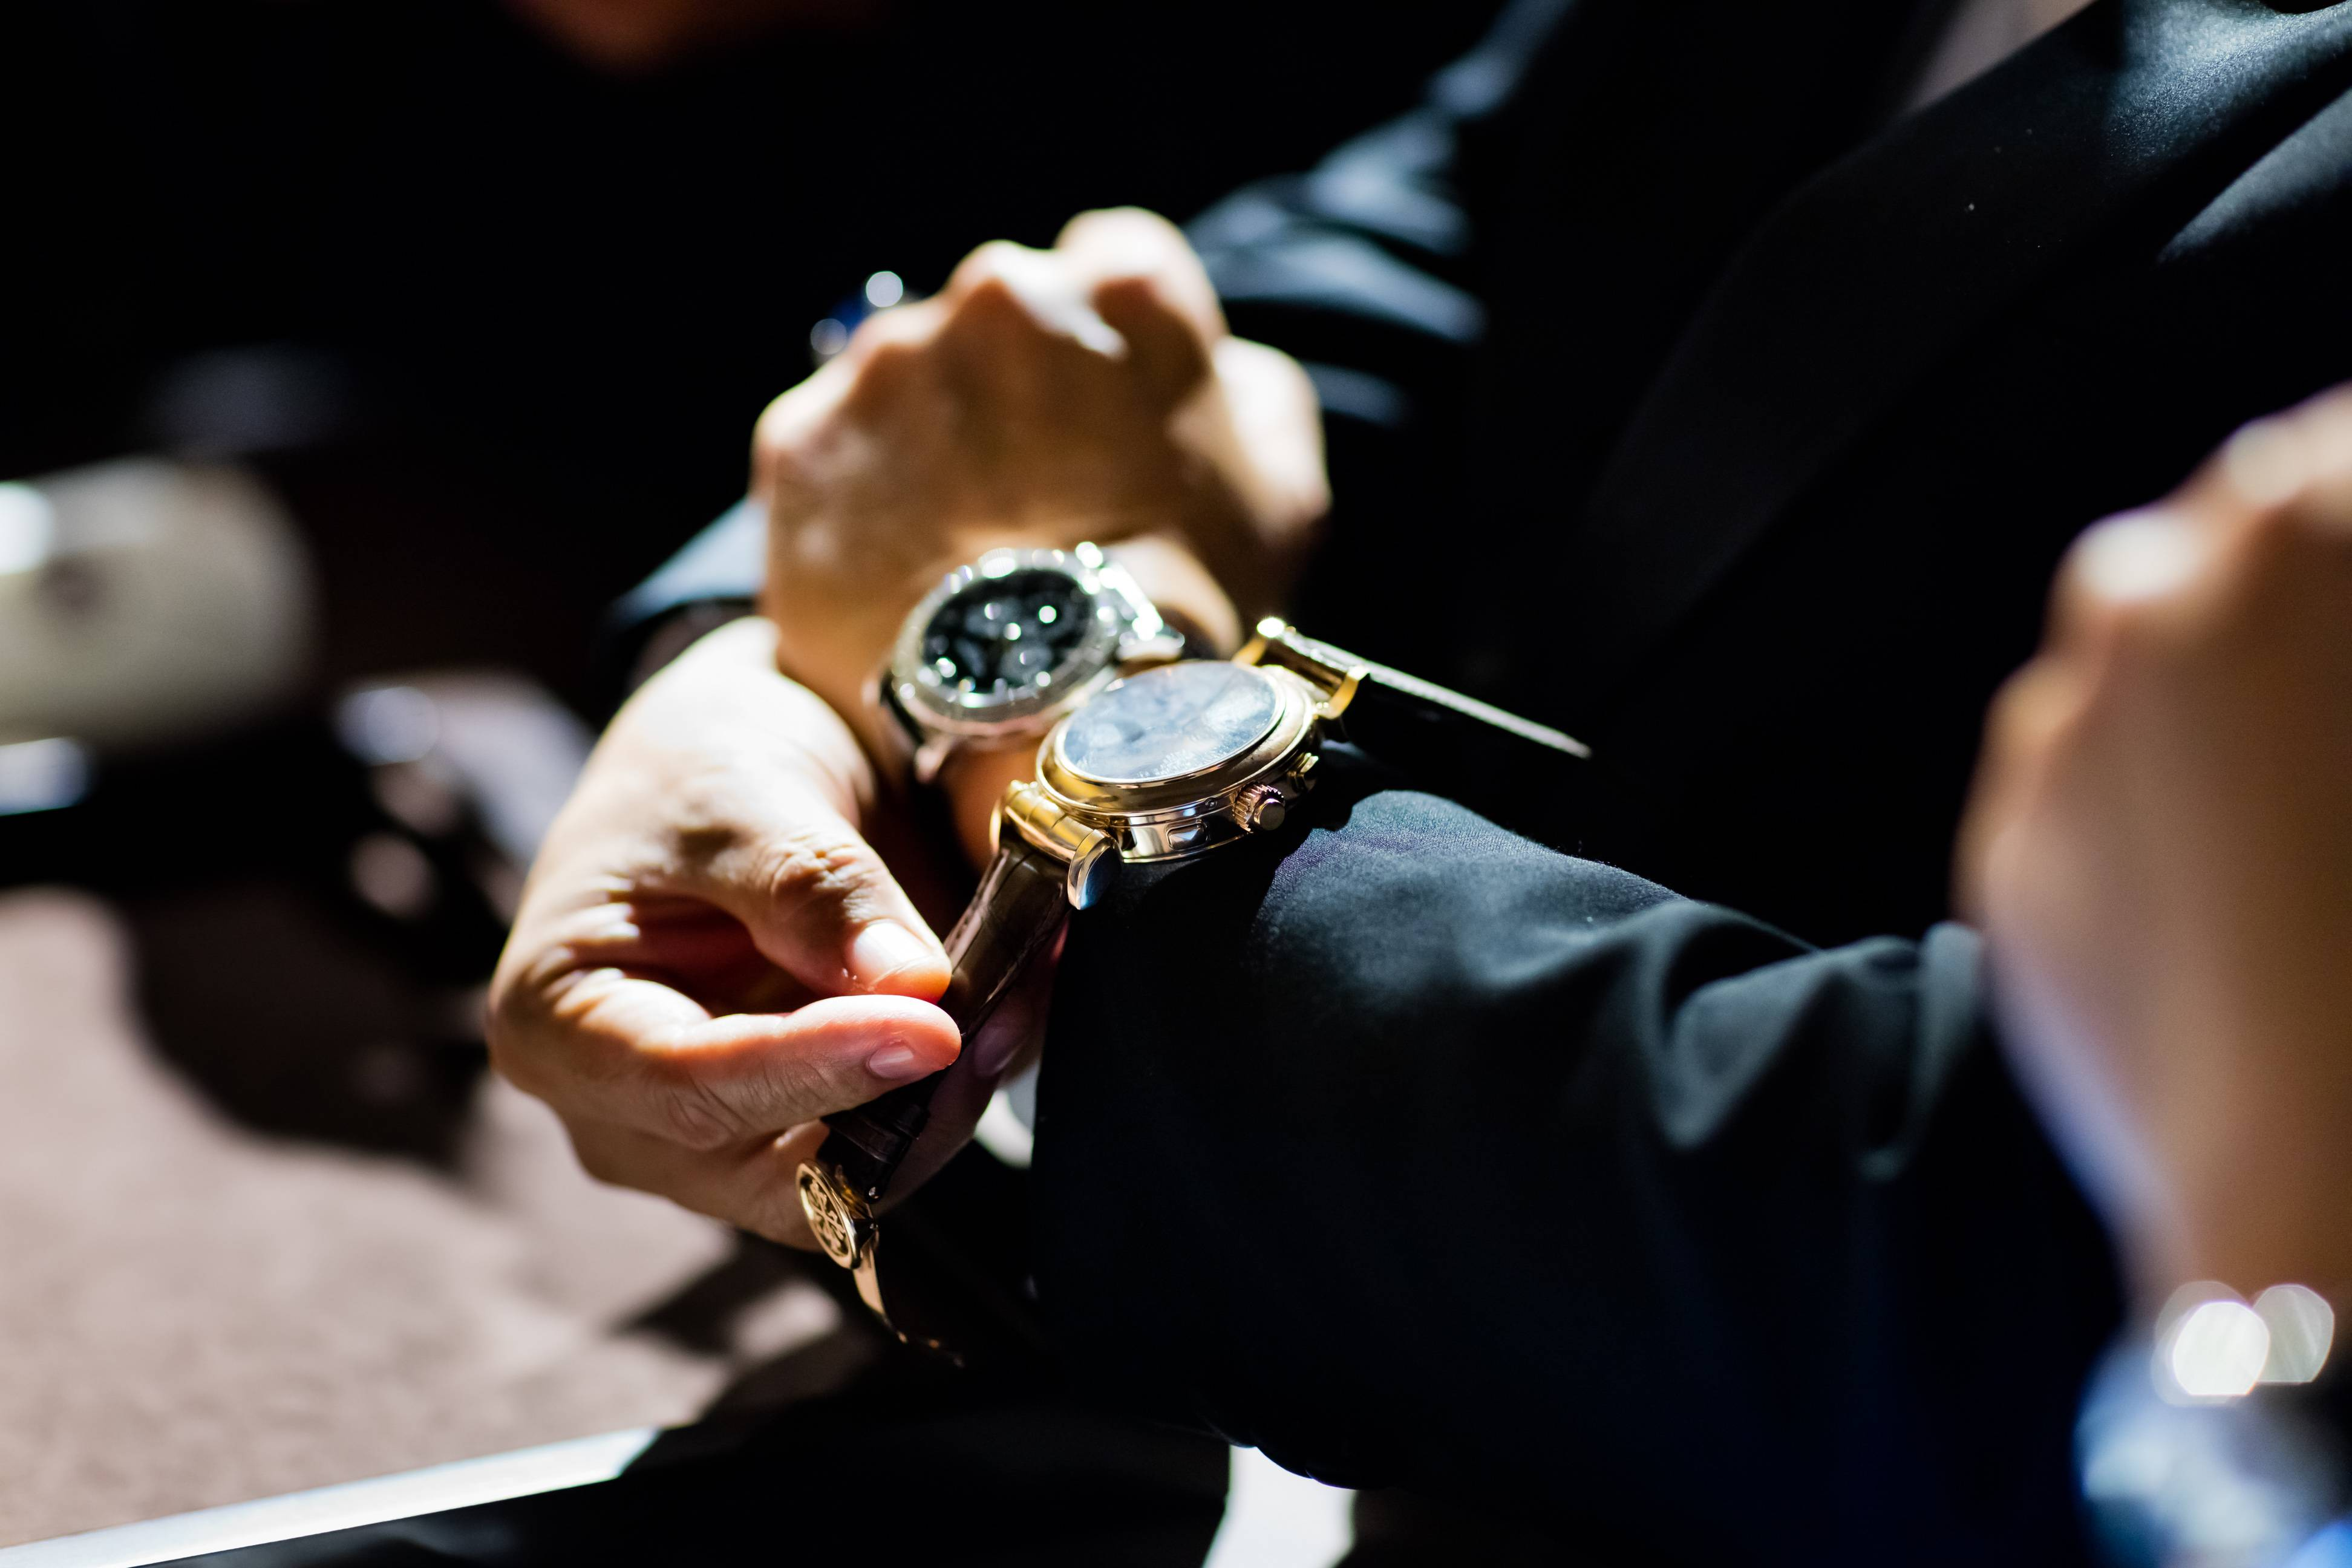 On the wrist, the Patek Philippe Grandmaster Chime